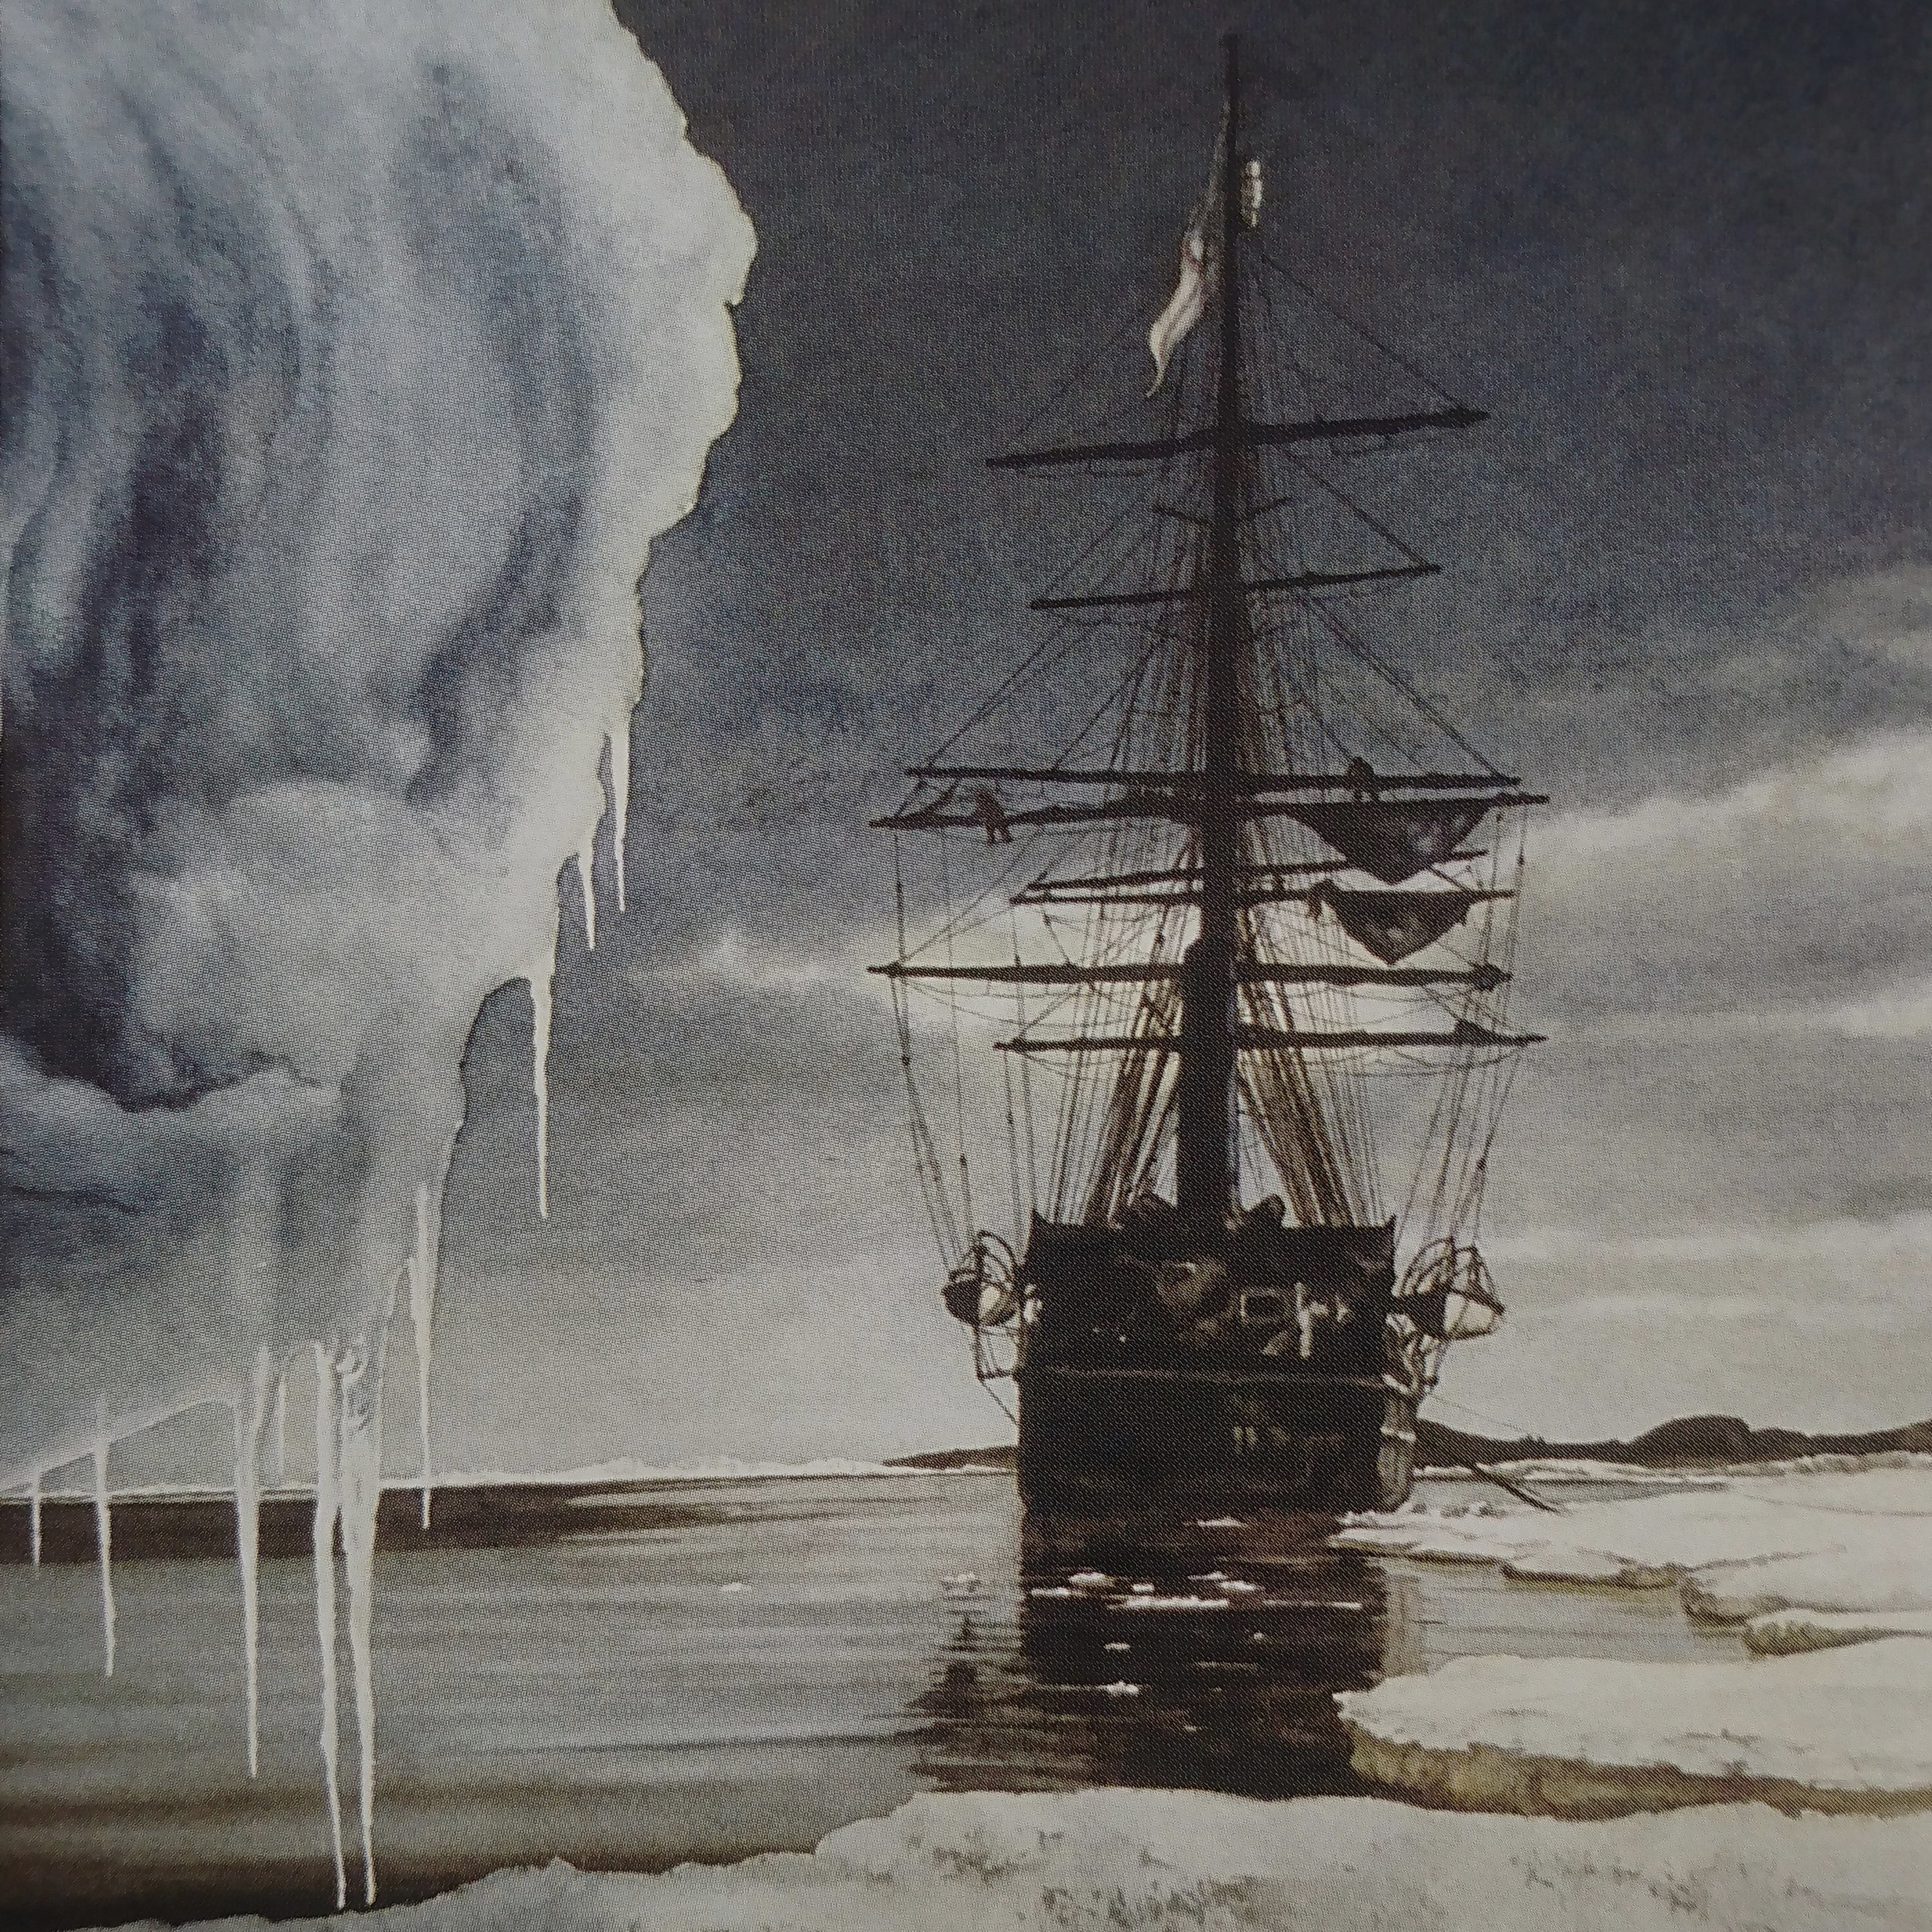 Image tirée de Polar Desert, Wally Herbert